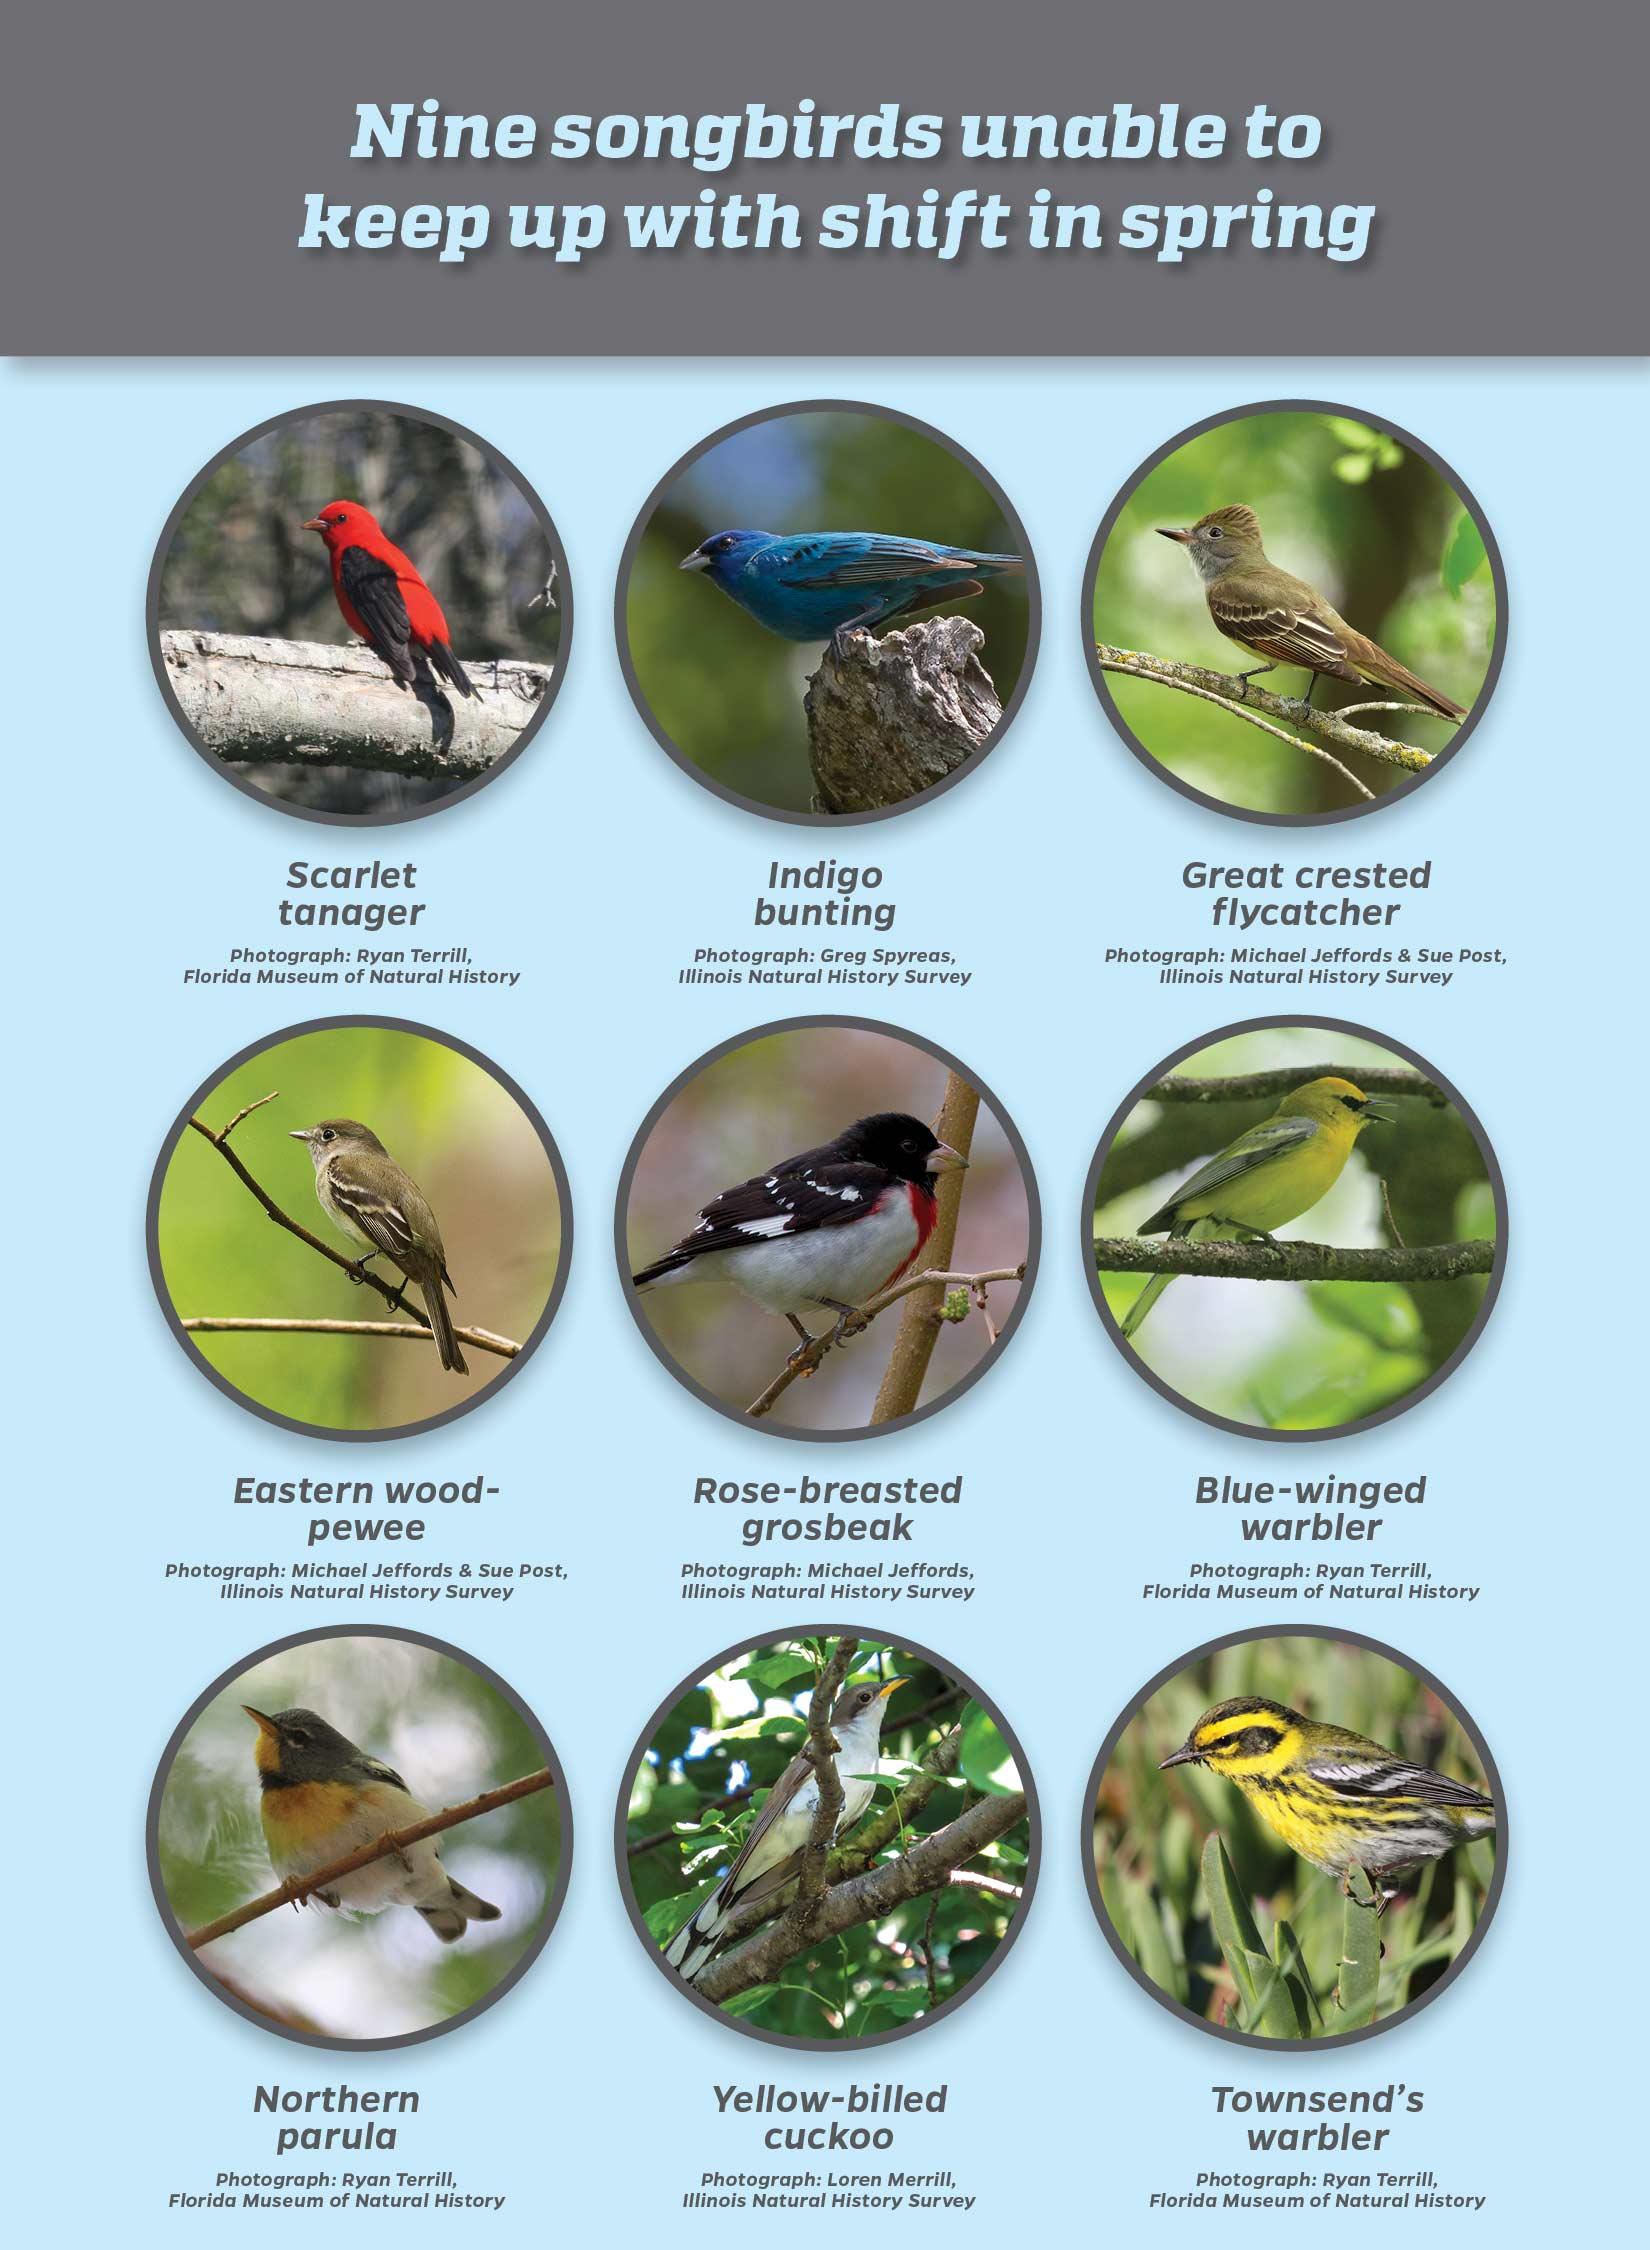 9 songbird species graphic